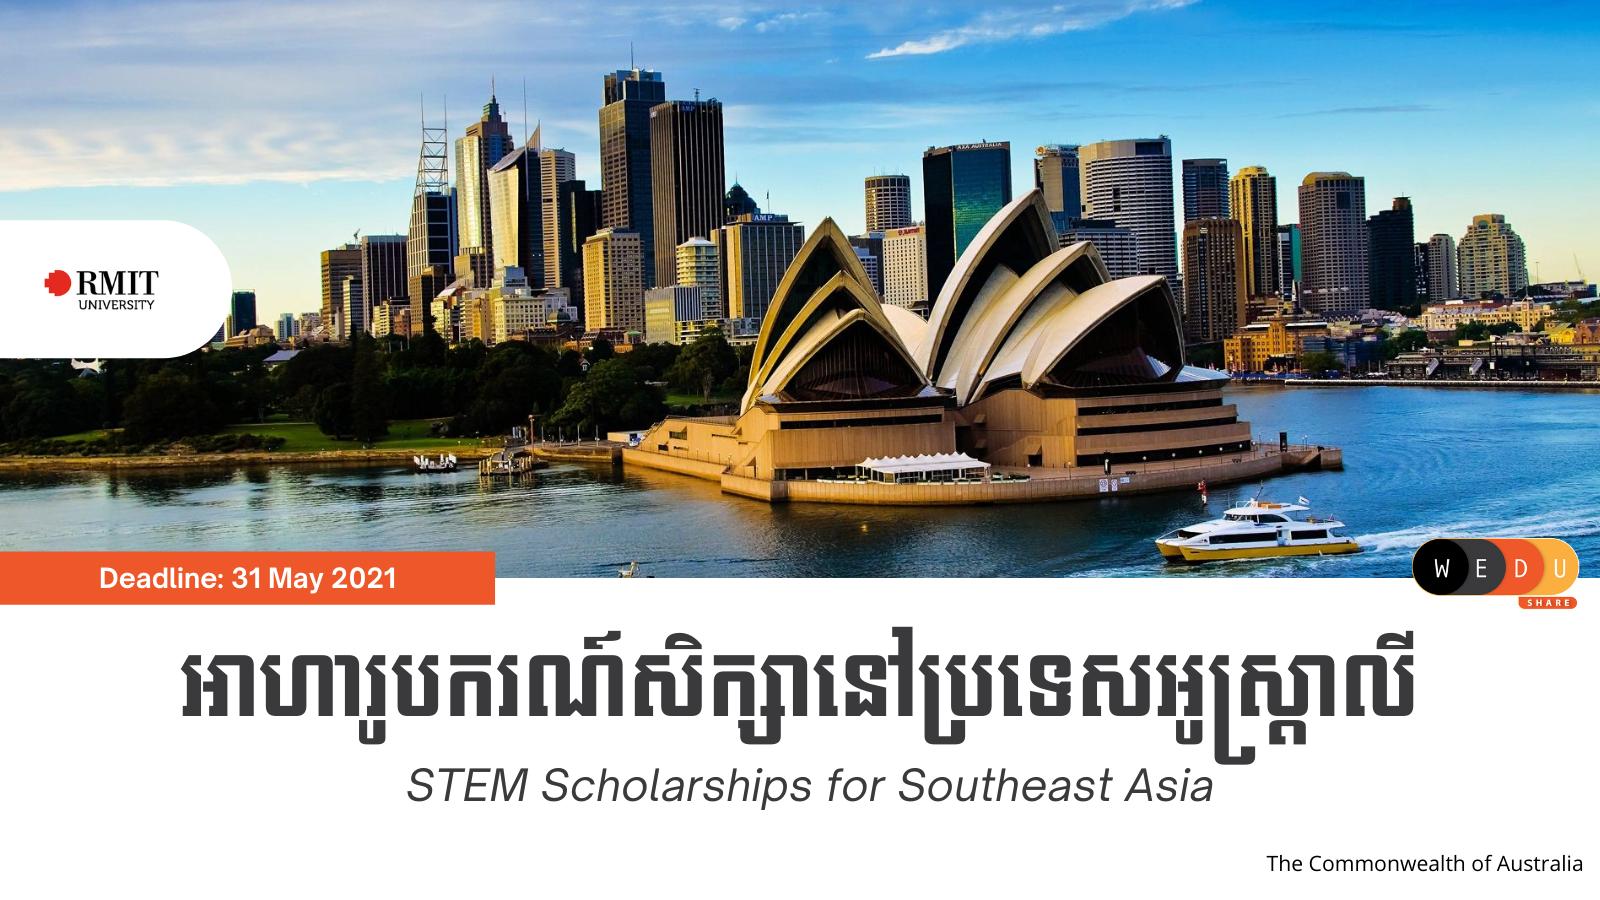 STEM Scholarships for Southeast Asia